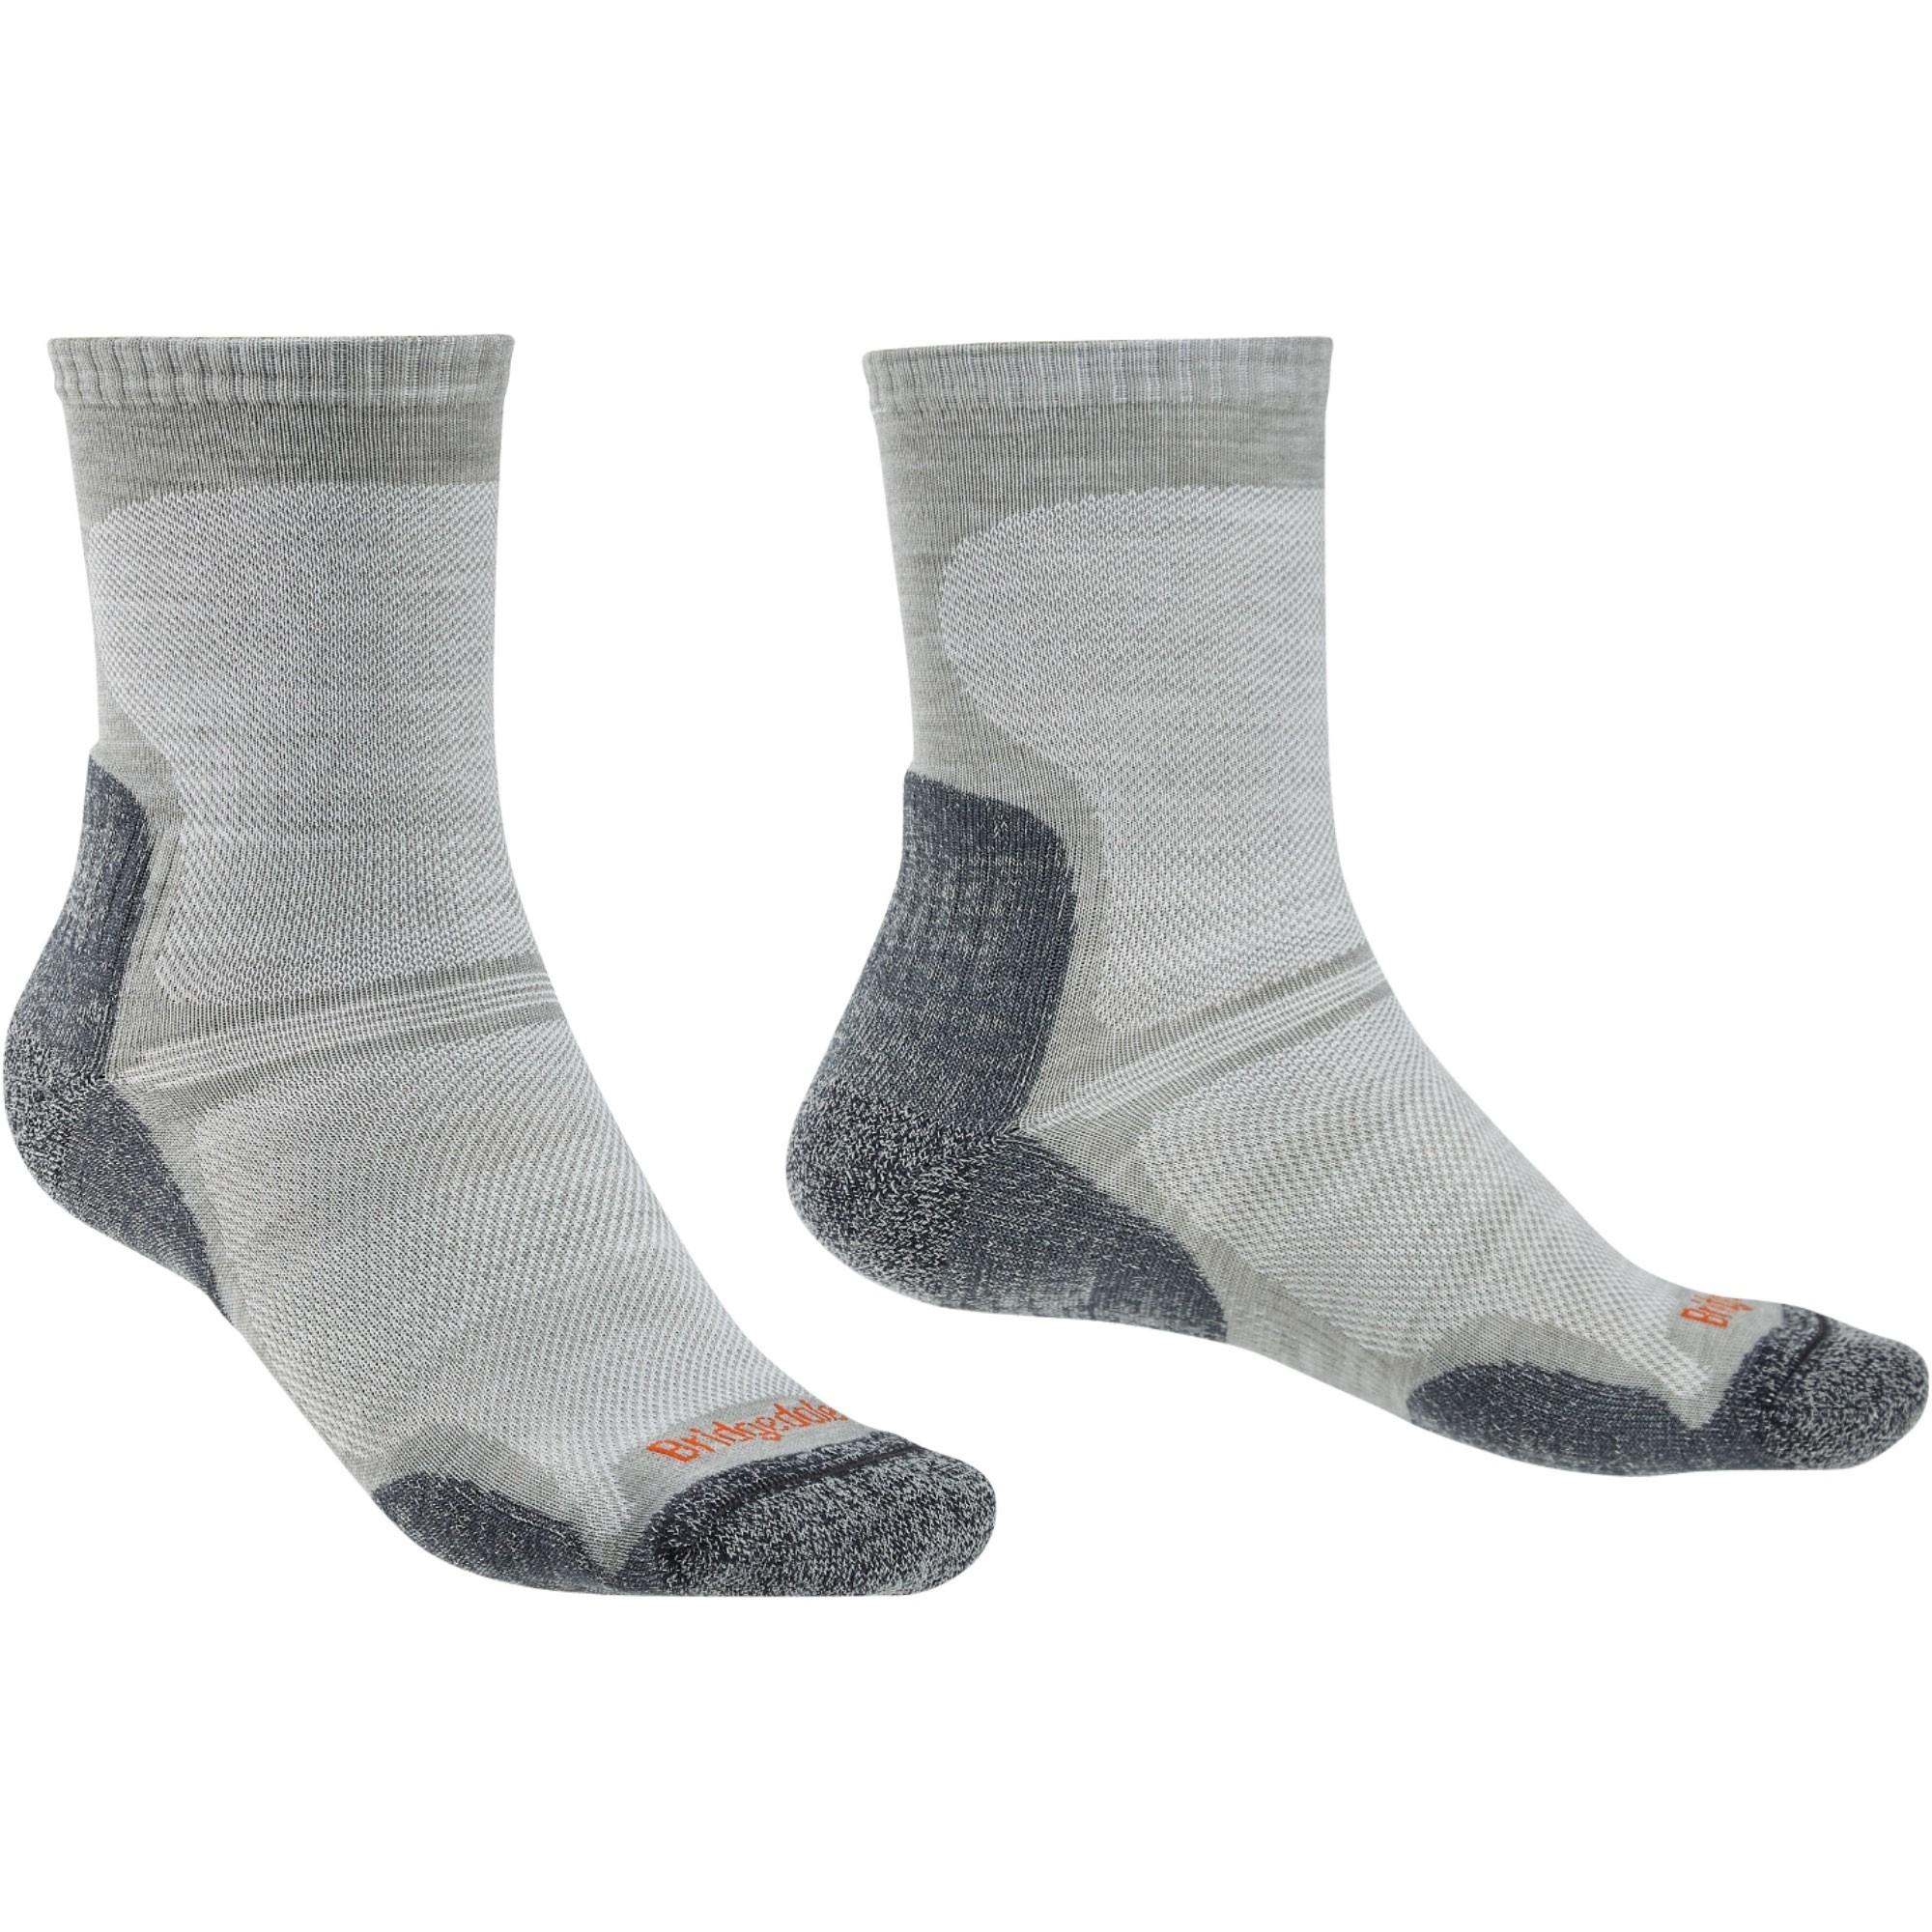 BRIDGEDALE - HIKE Ultra Light Merino Endurance Men's Sock - Gunmetal